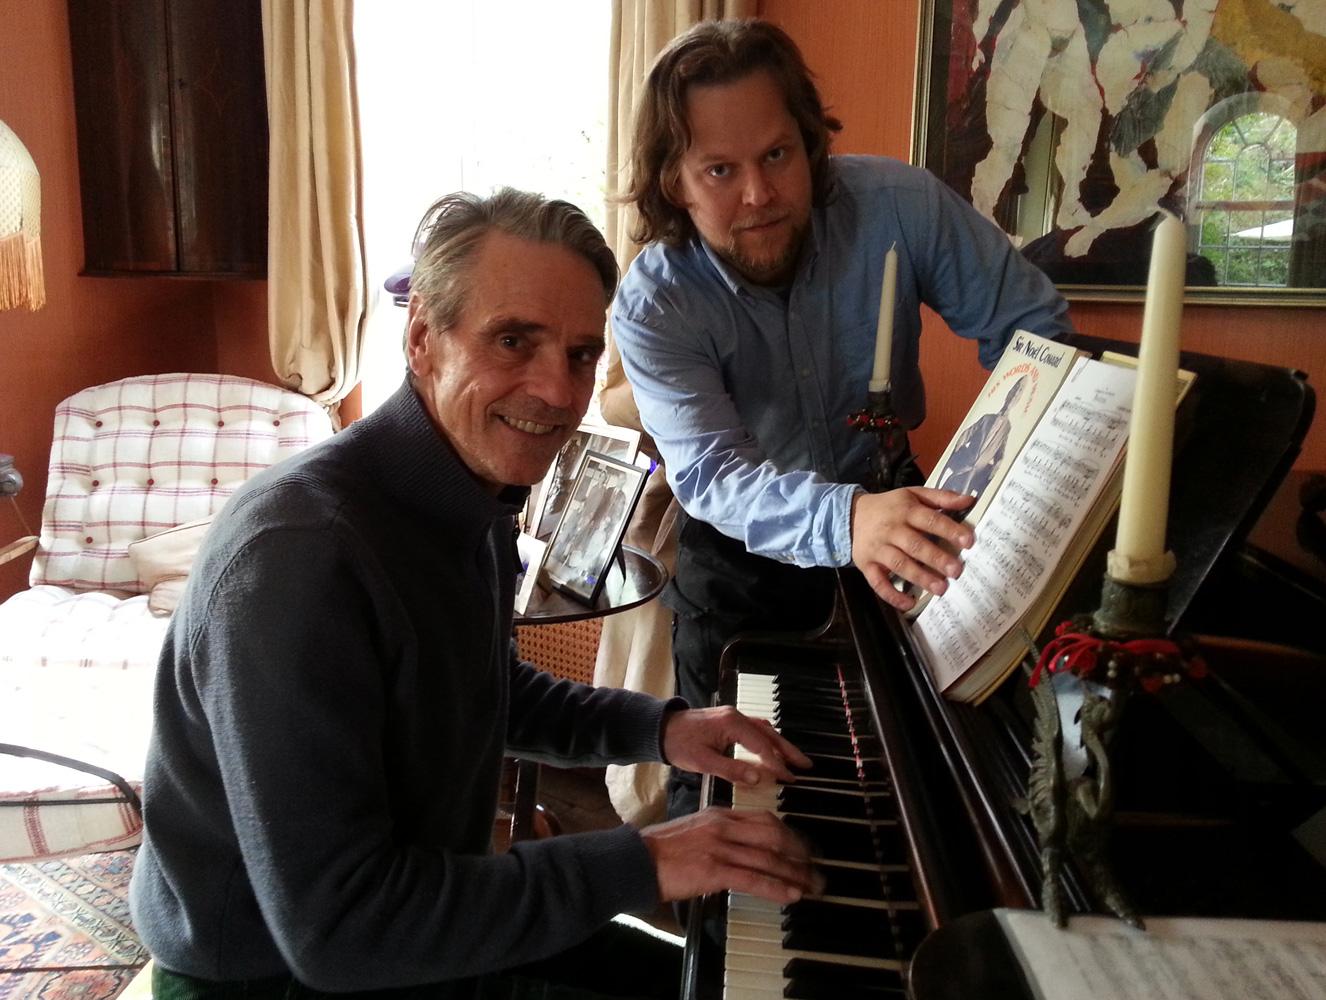 Legendary Actor Jeremy Irons Enjoys Learning Experience With Matej Lehocky